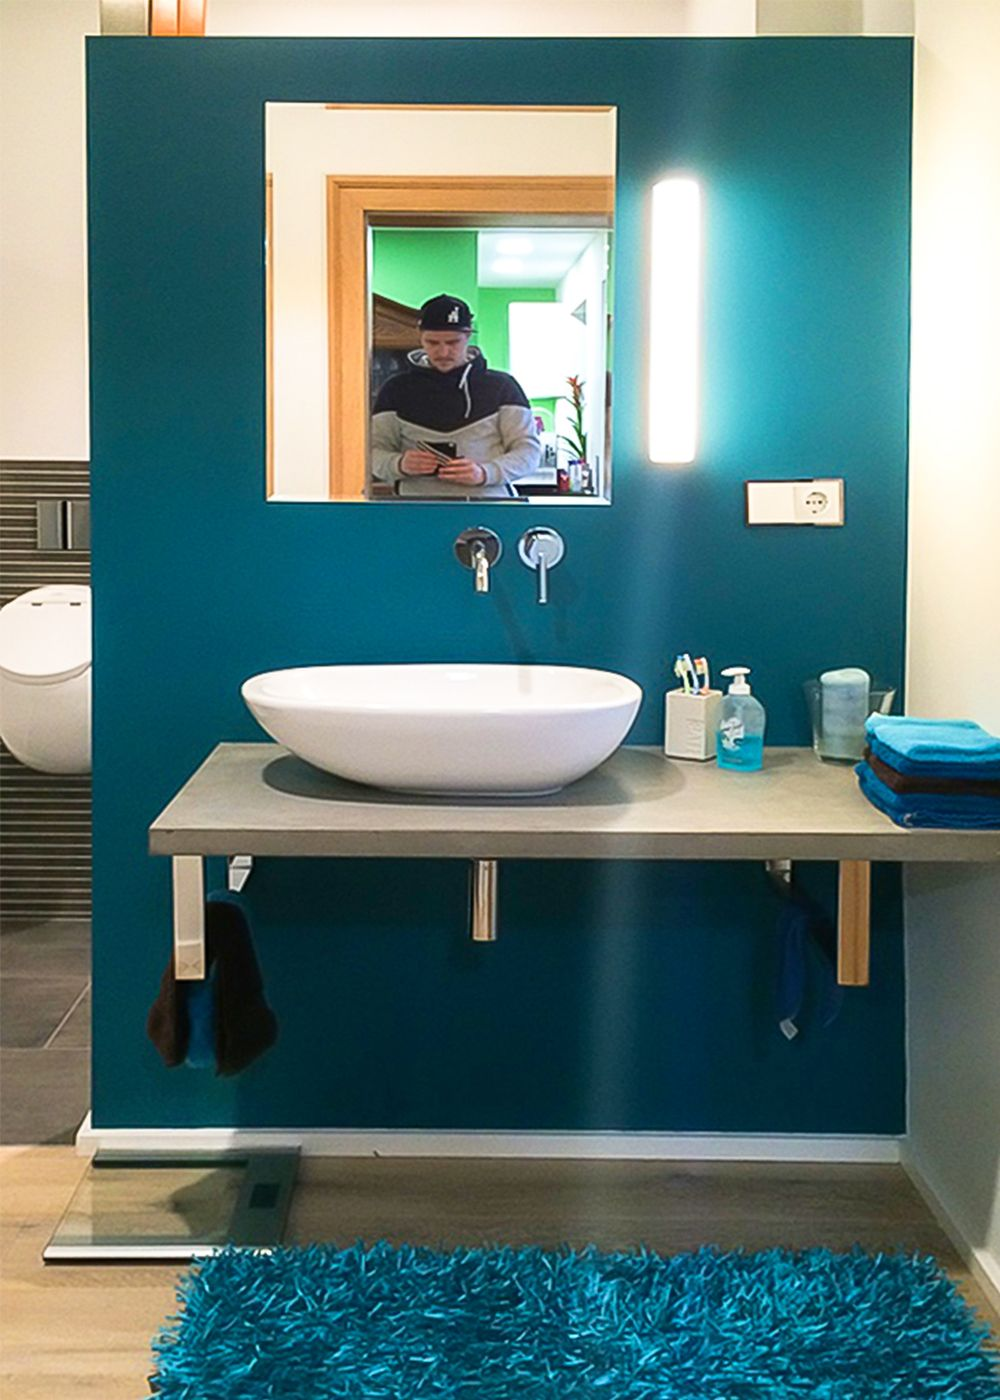 Schmuckwand Im Badezimmer Petrol Wandgestaltung Hingucker Turkis Badezimmer Petrol Badezimmer Bad Styling